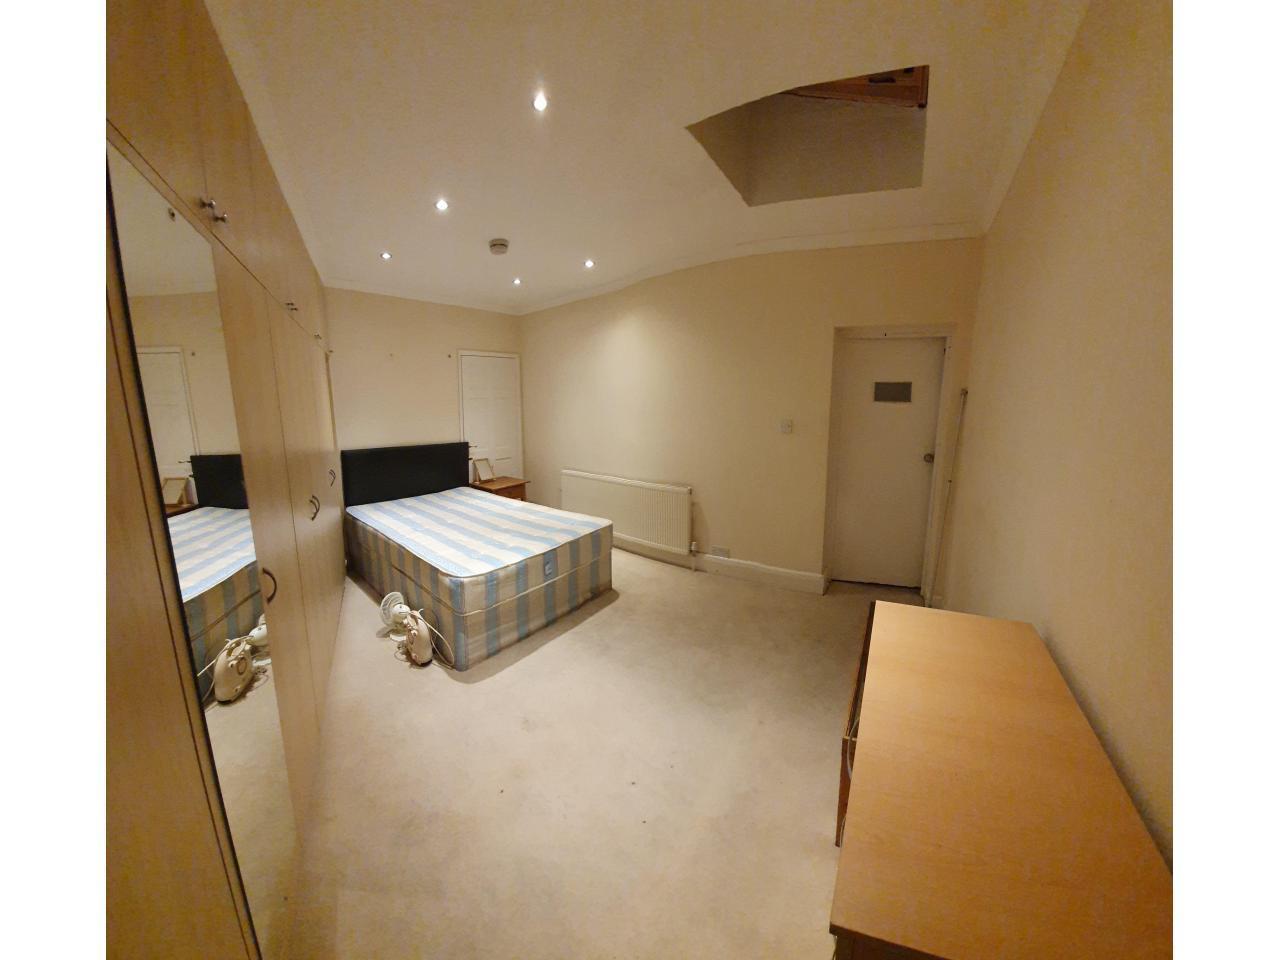 Сингл и Дабл комнаты в аренду на Neasden / Sudbury Hill / Harrow / Greenford. - 2